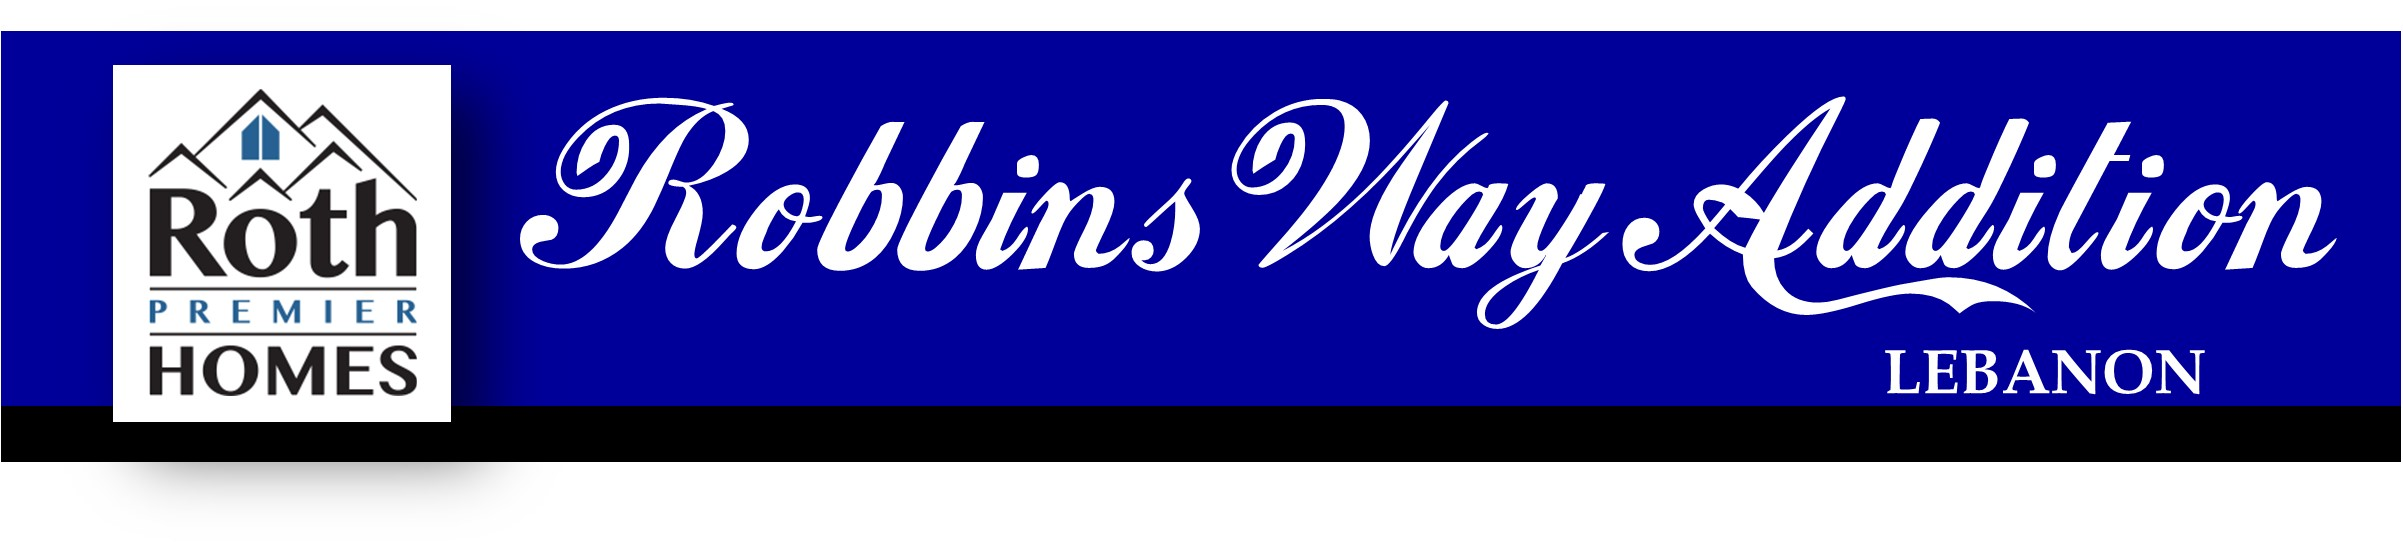 Robbins Way Addition